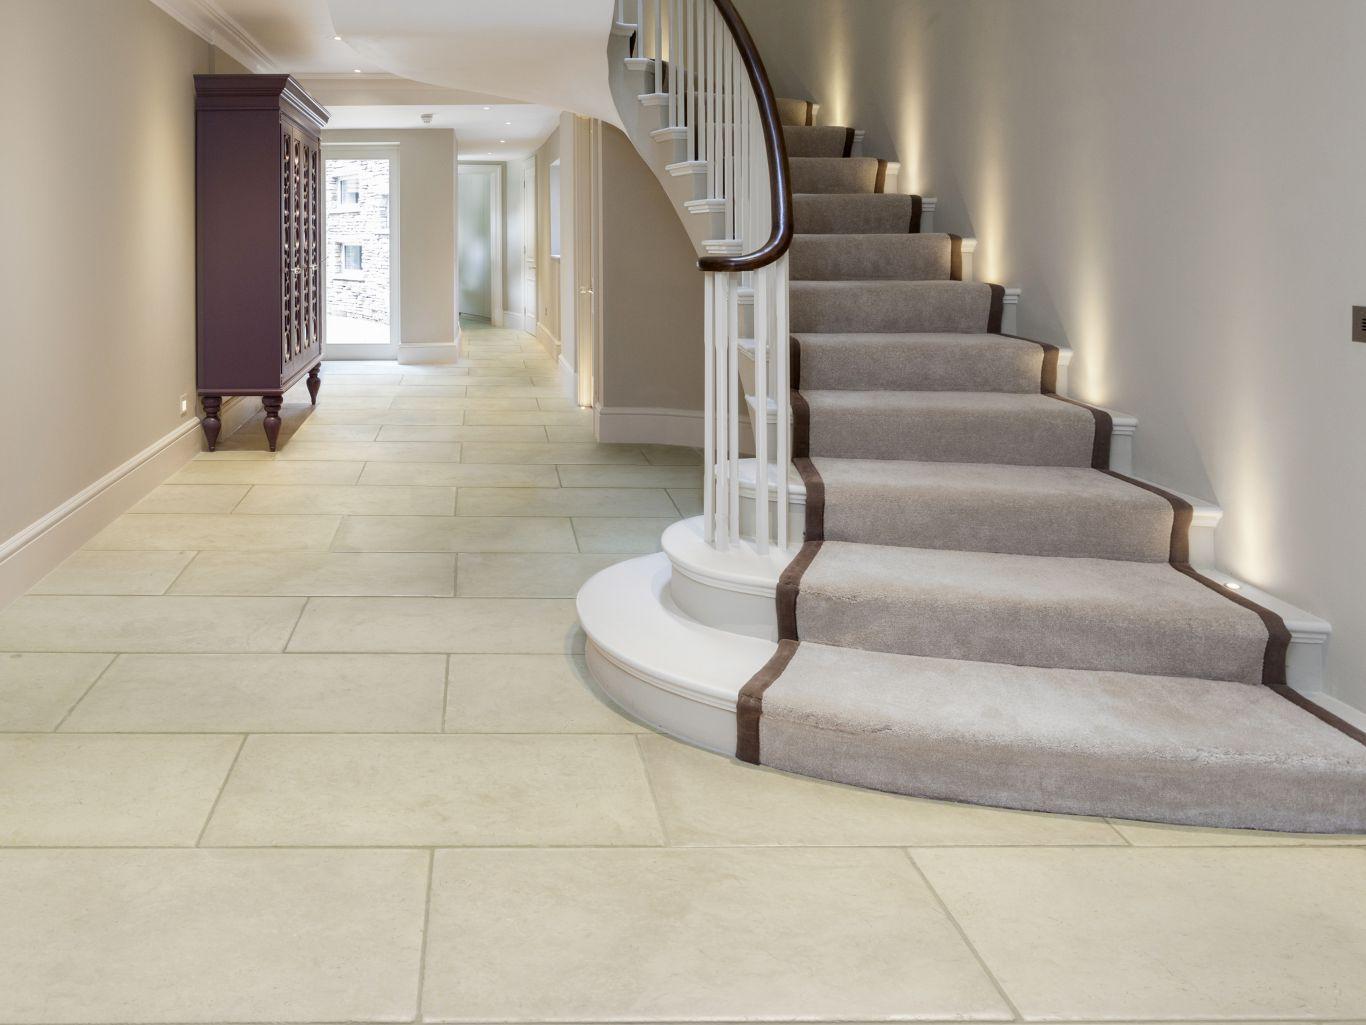 Ca pietra floor tile google search house inspiration pinterest ca pietra floor tile google search dailygadgetfo Gallery